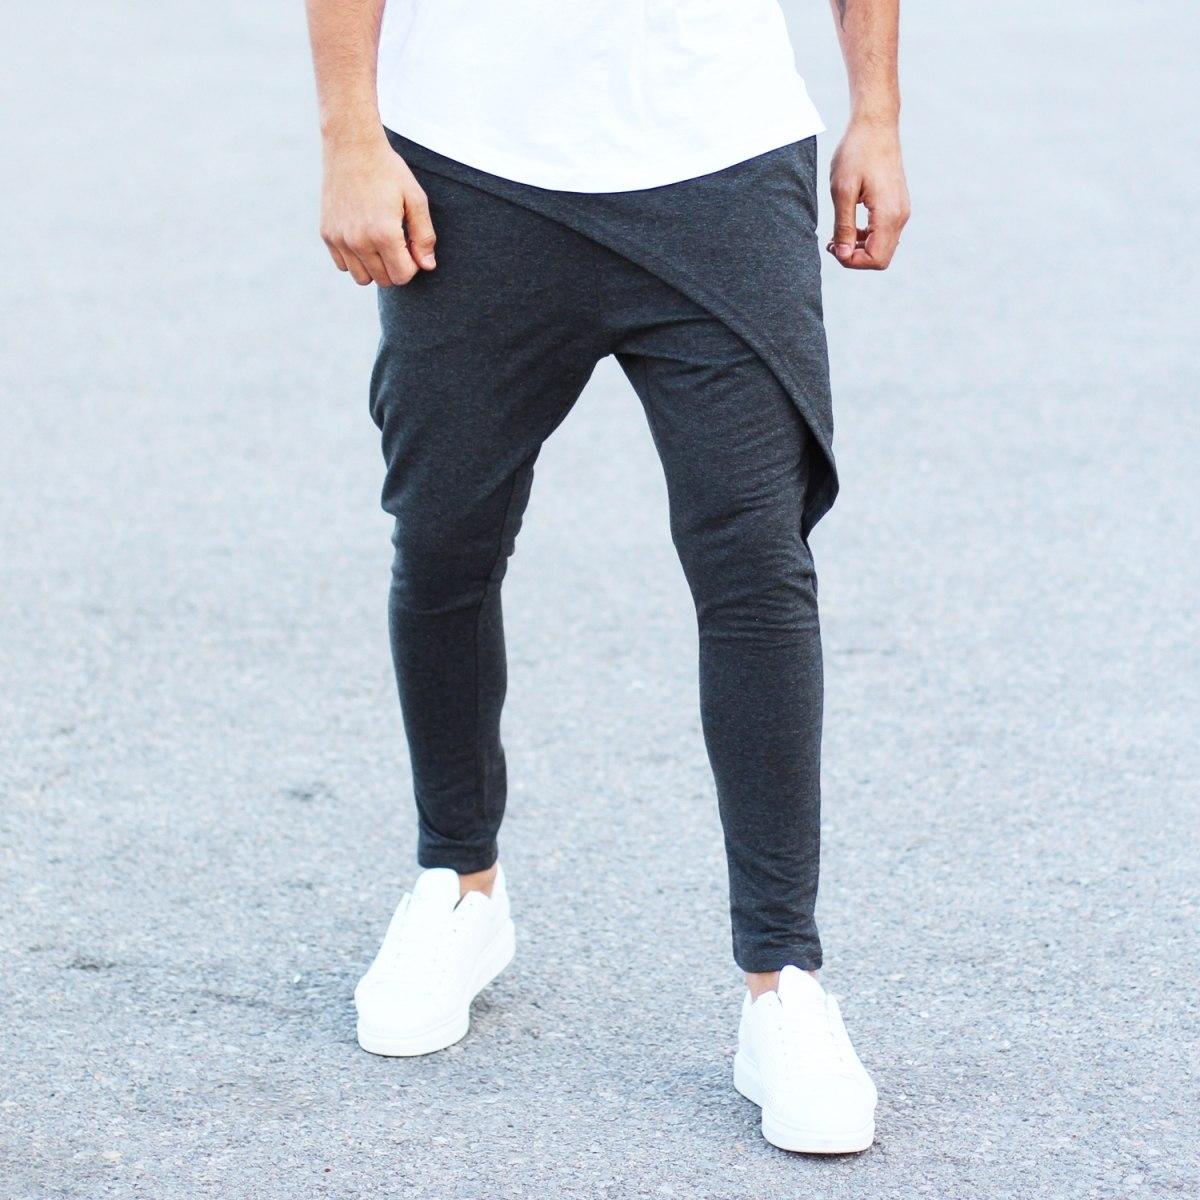 Men's Stylish Sport Pants In Gray